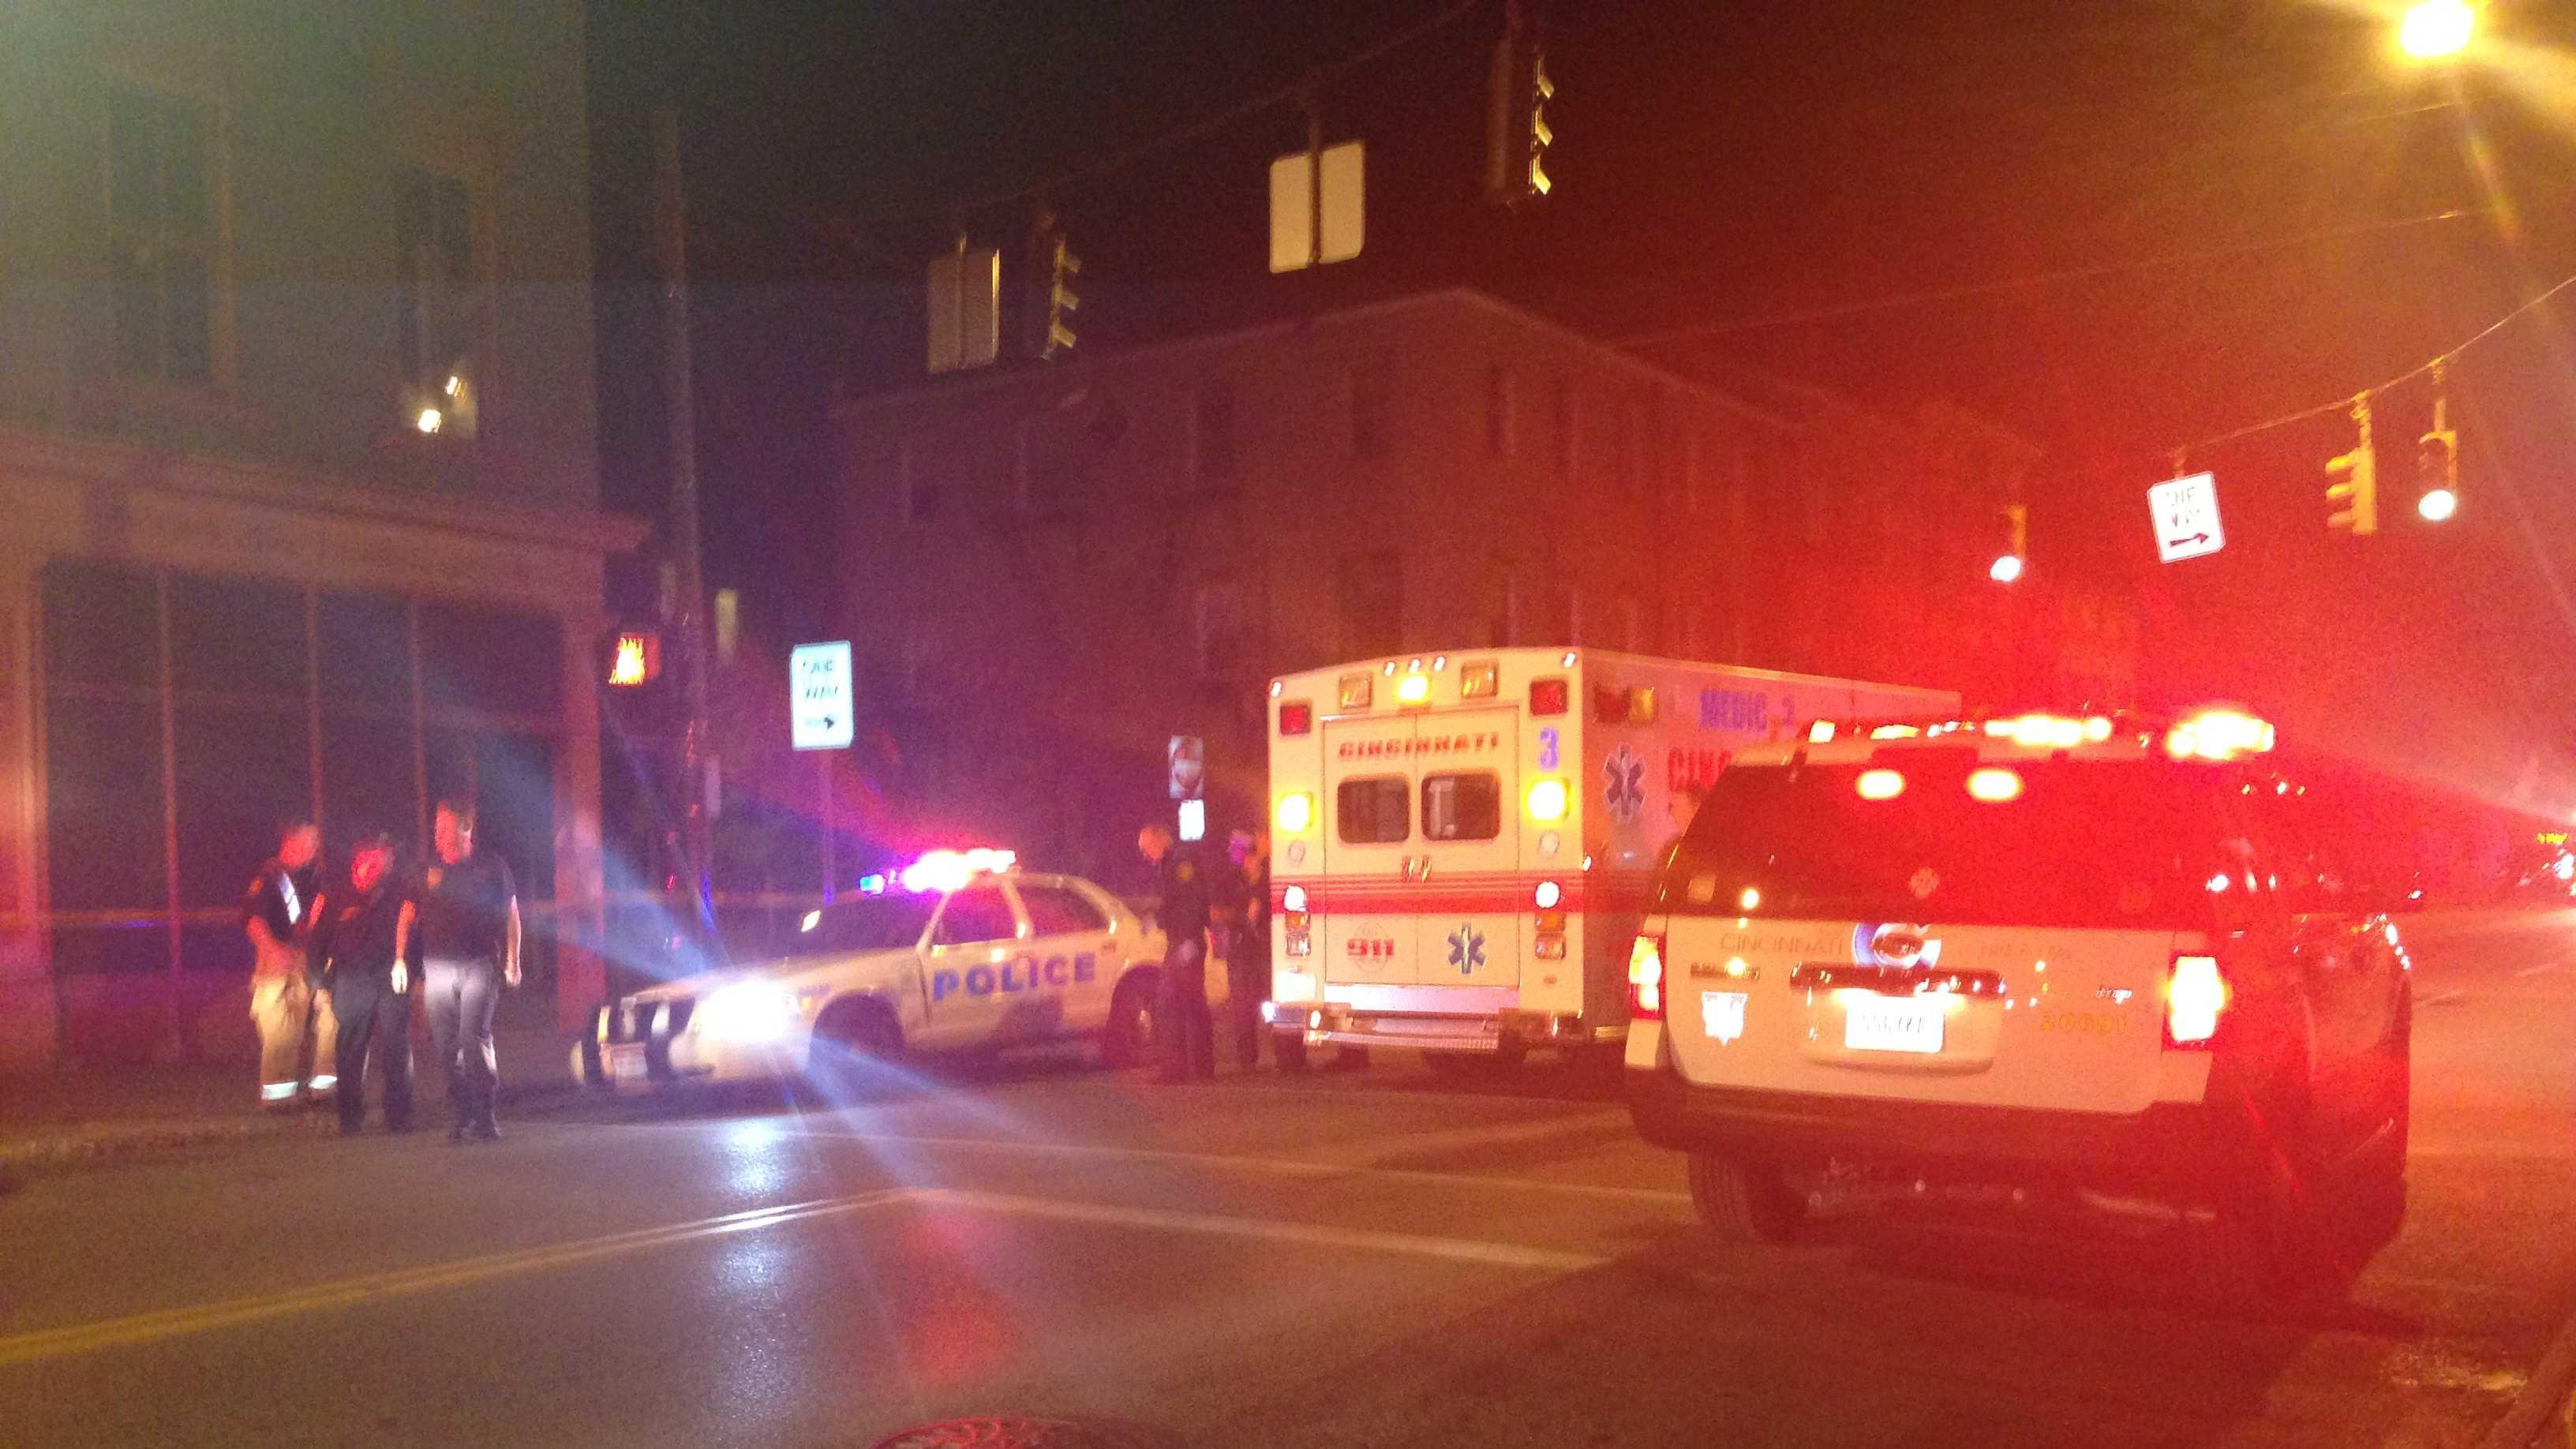 110913 officer hit woman (3).jpg